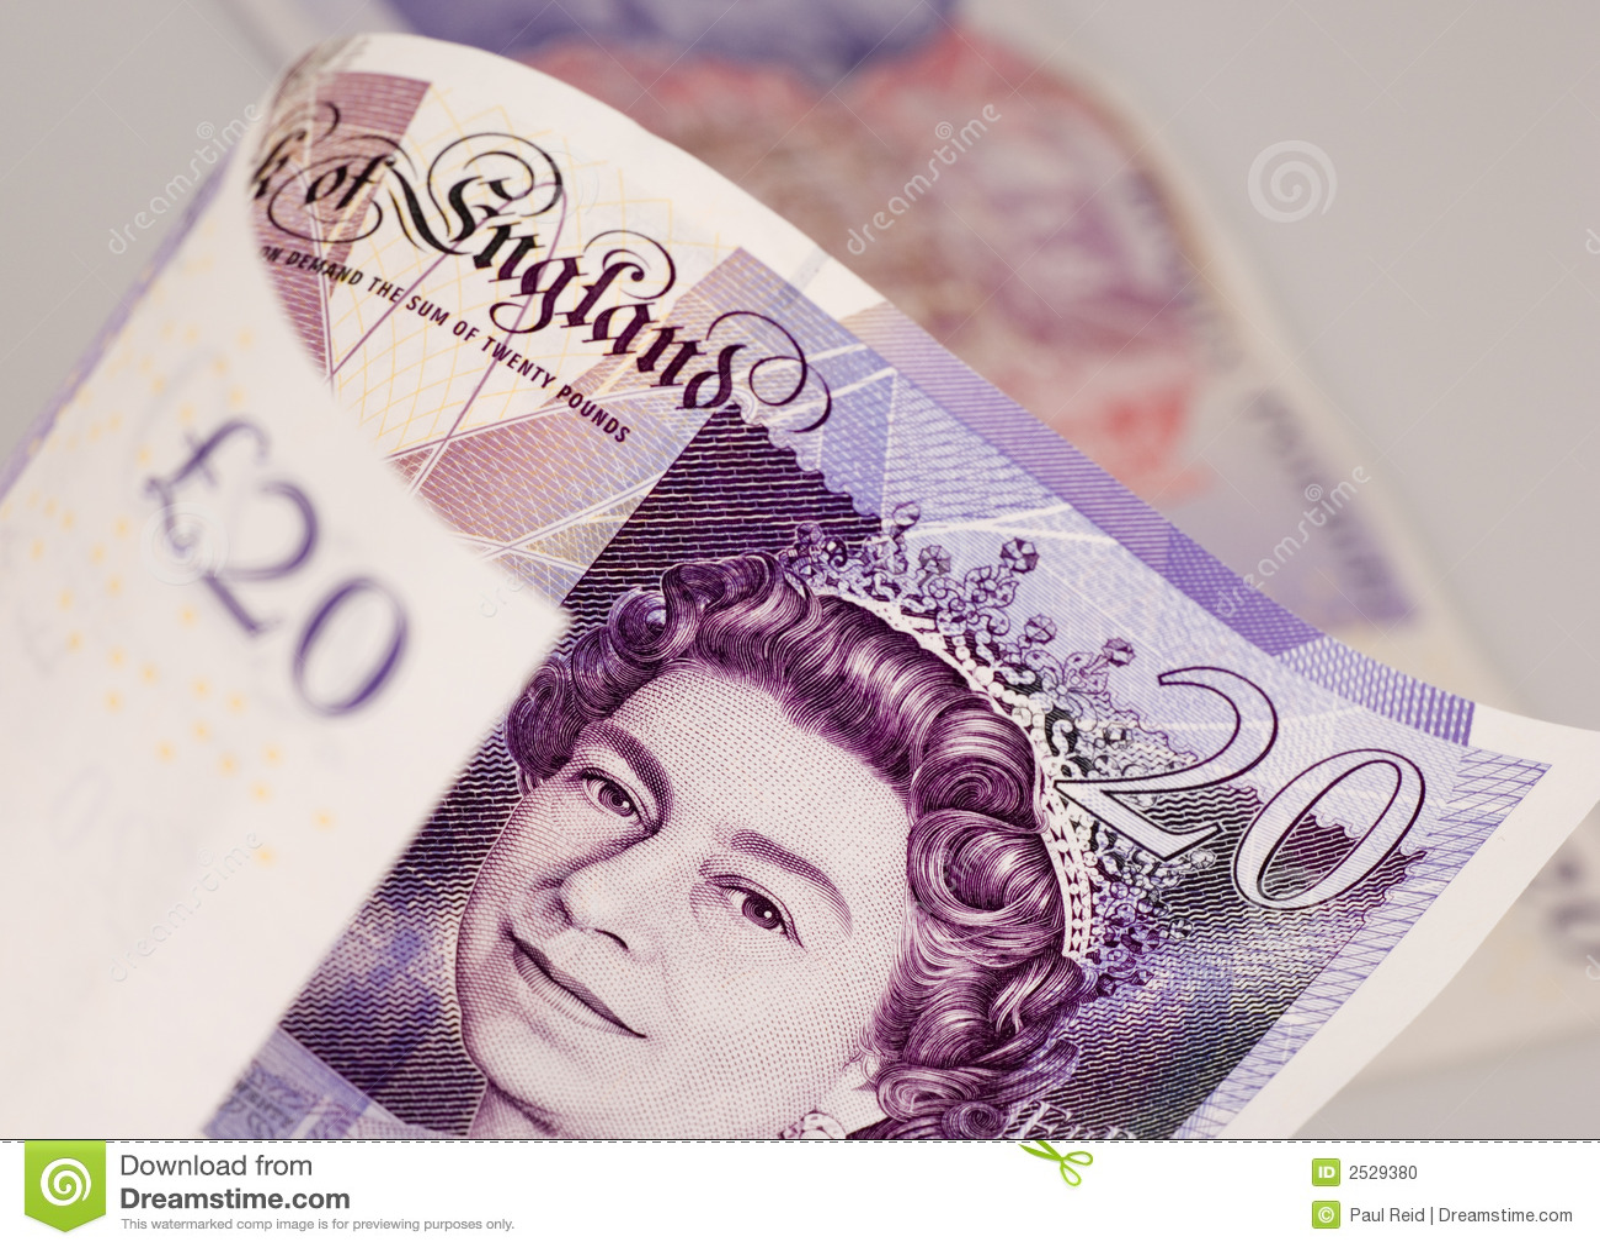 geld Engels pijpbeurt